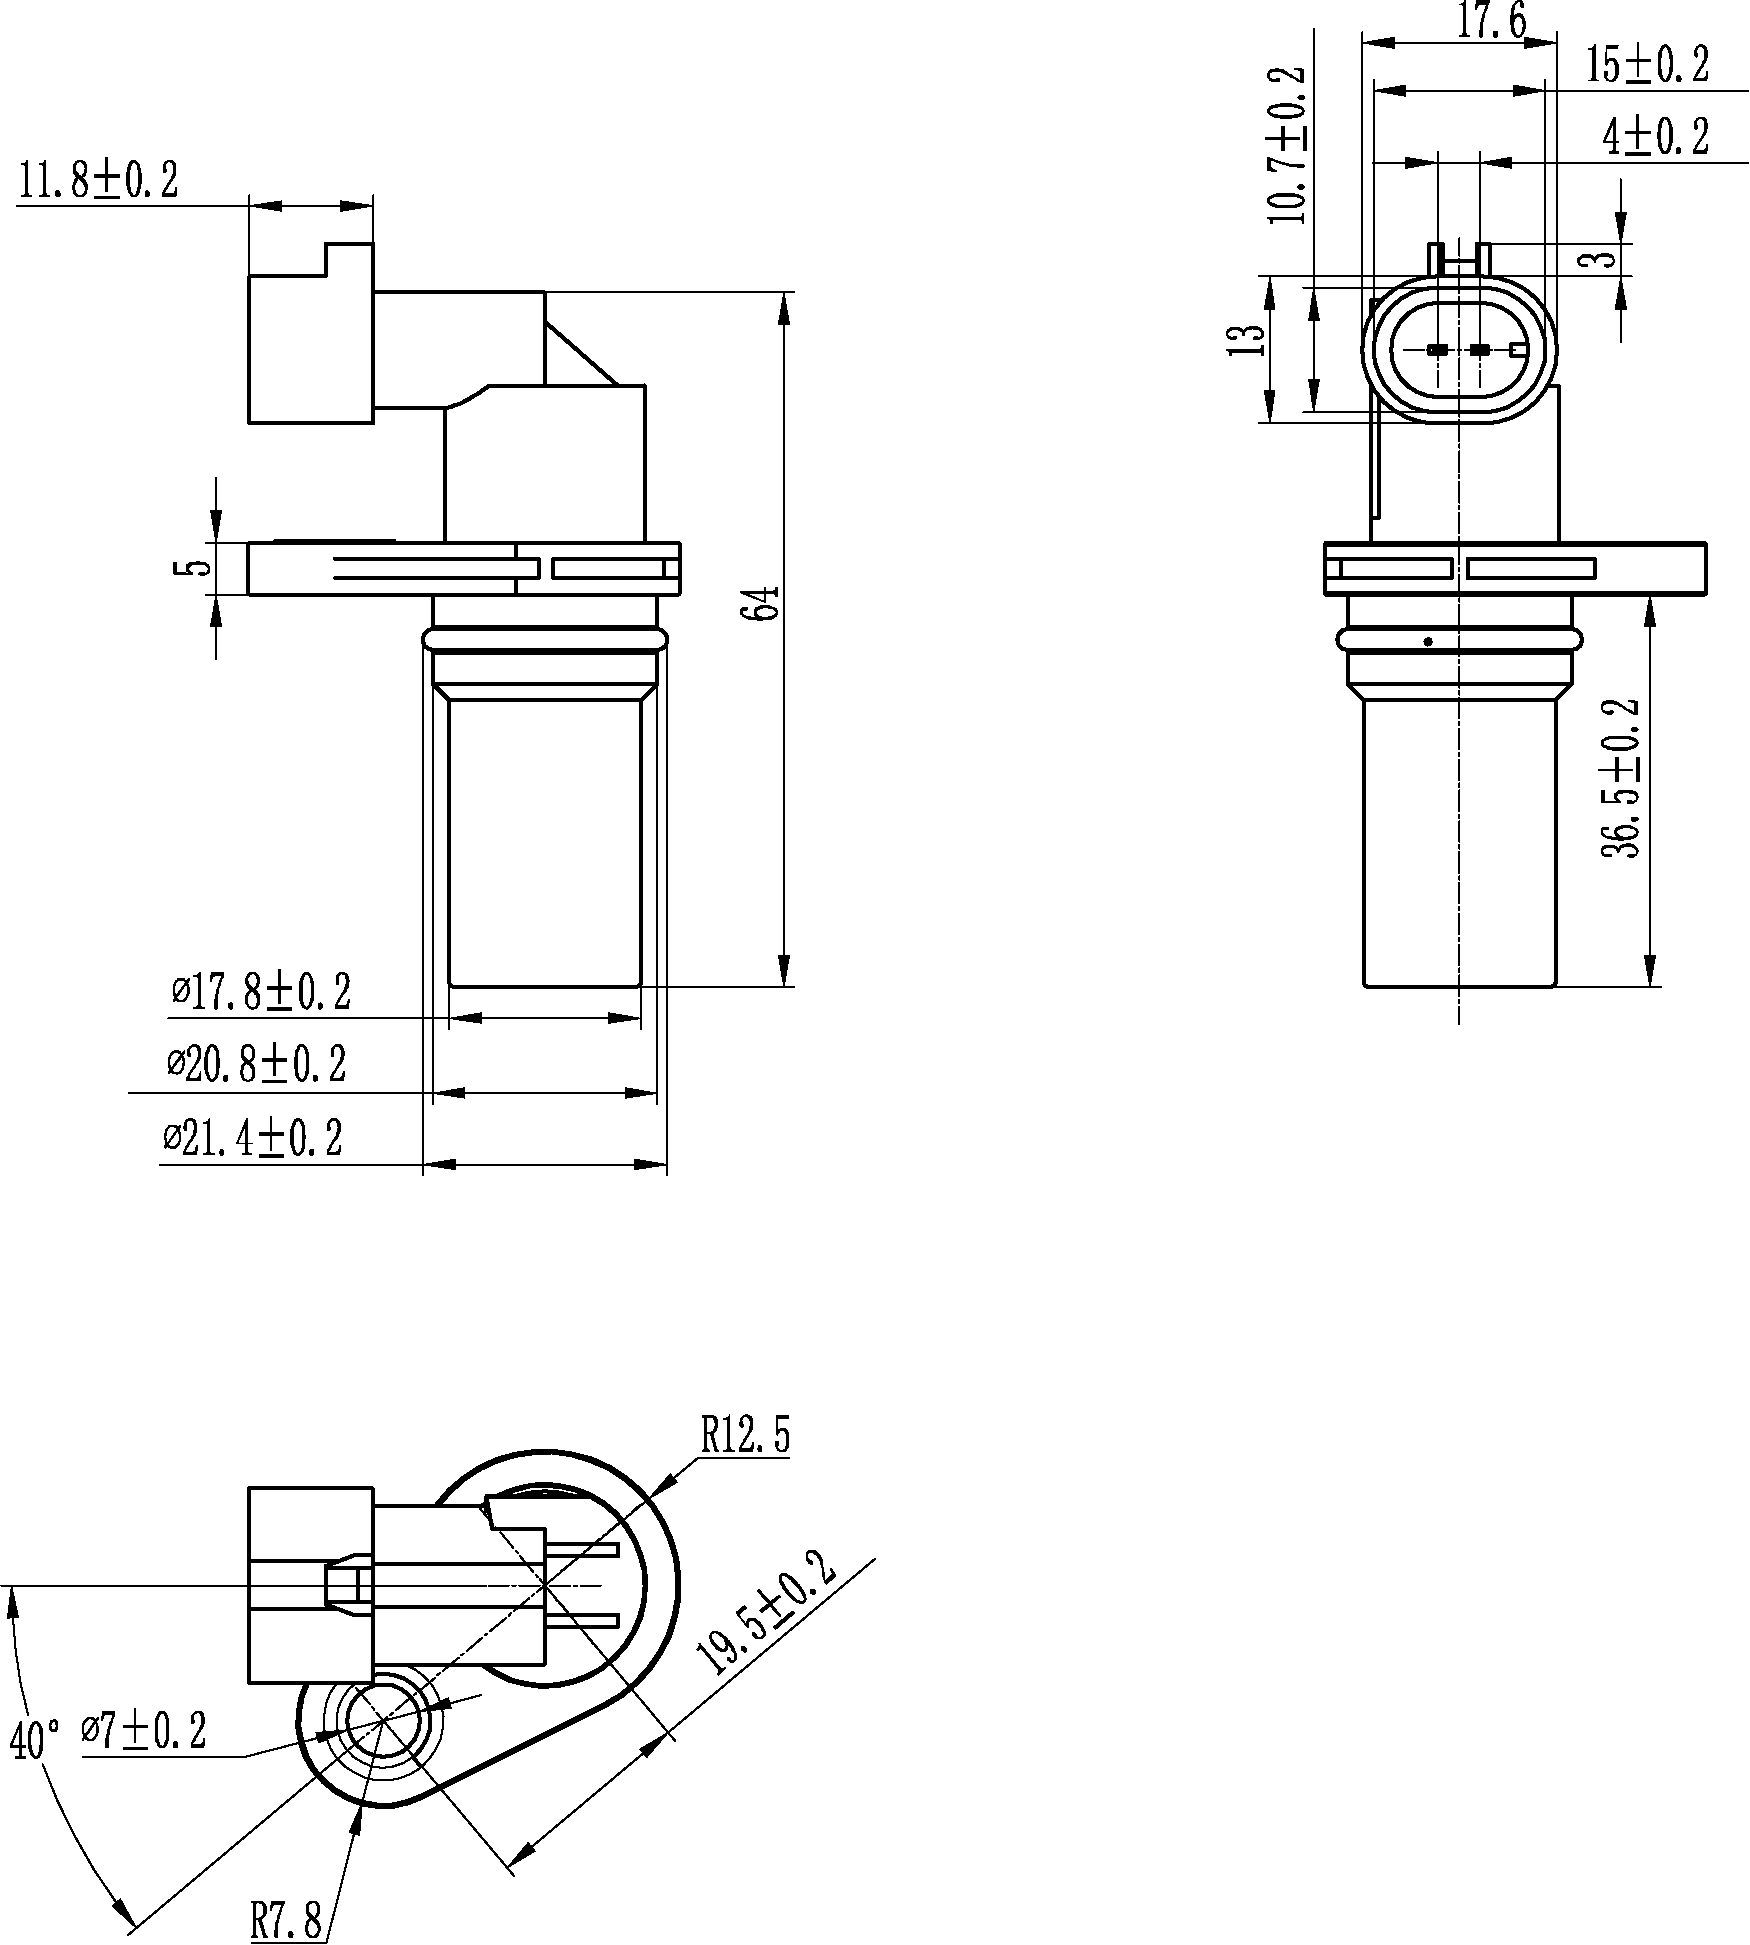 Crank Position Sensor Jeep 4 0l Engine Diagram Manual Of Wiring 2 5 150679 Crankshaft Rh Hc Cargo Co Uk